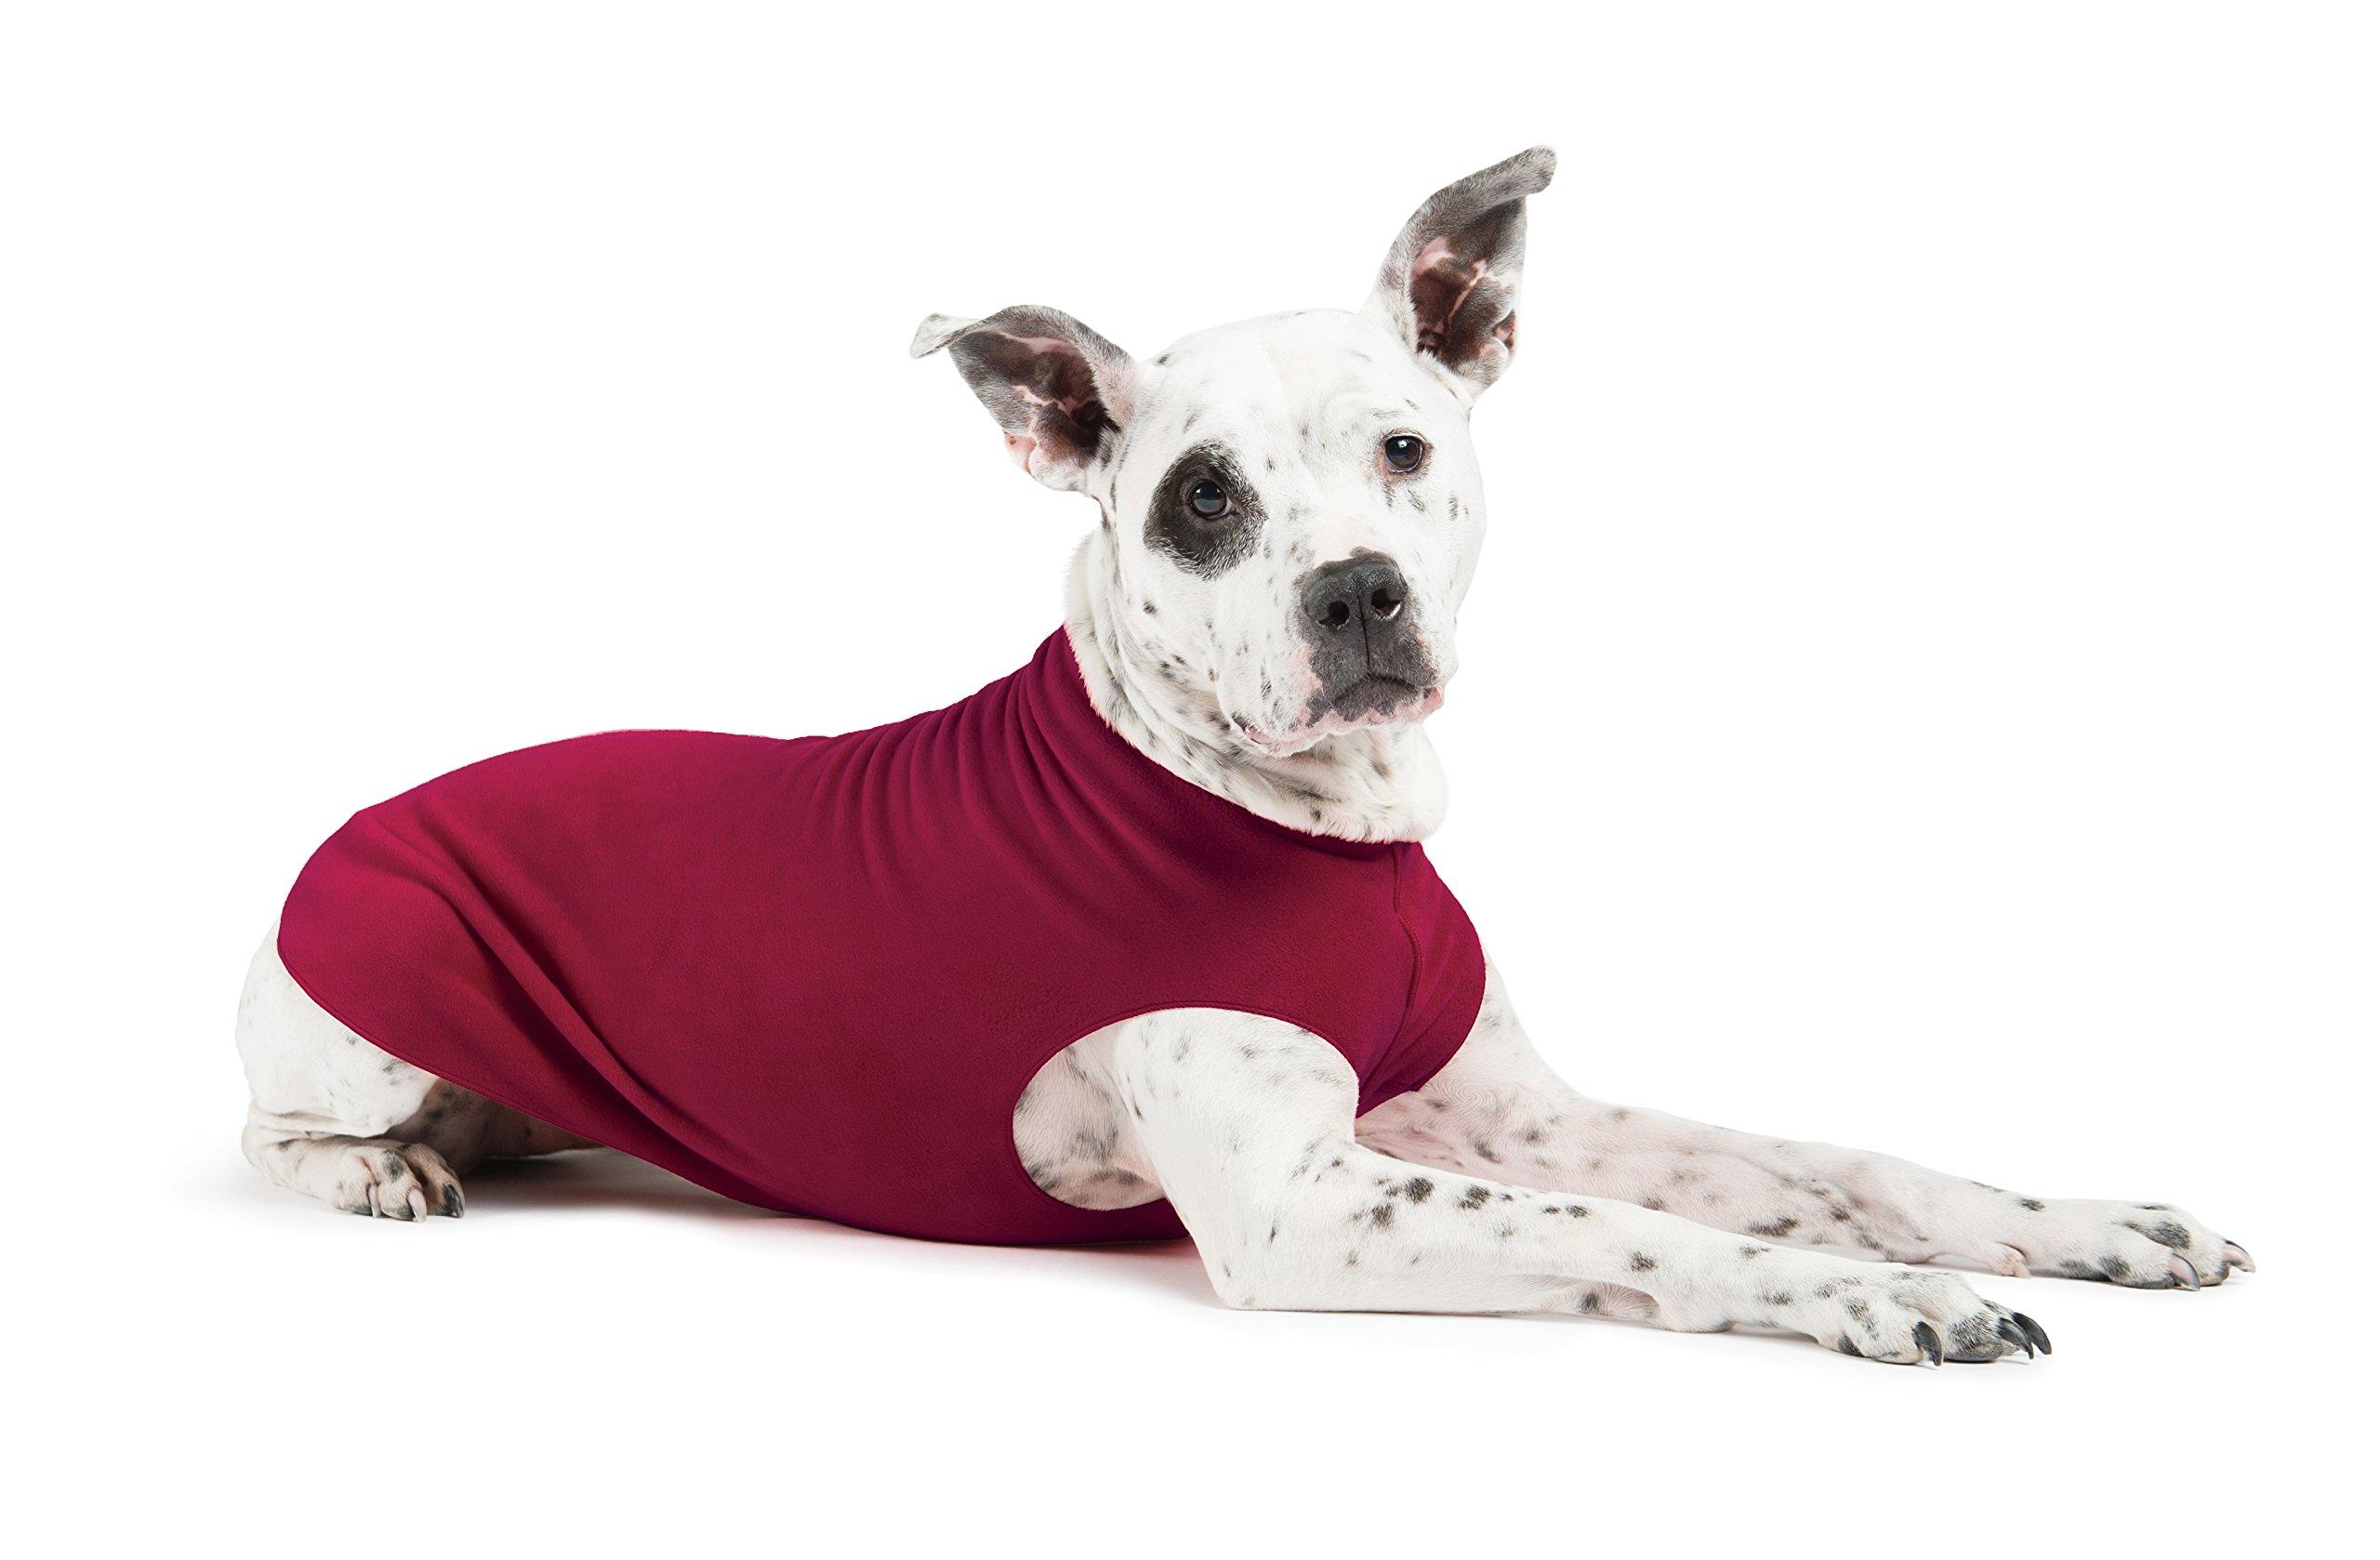 Gold Paw Stretch Fleece Dog Coat - Soft, Warm Dog Clothes, Stretchy Pet Sweater - Machine Washable, Eco Friendly - All Season - Sizes 2-33, Garnet, Size 12